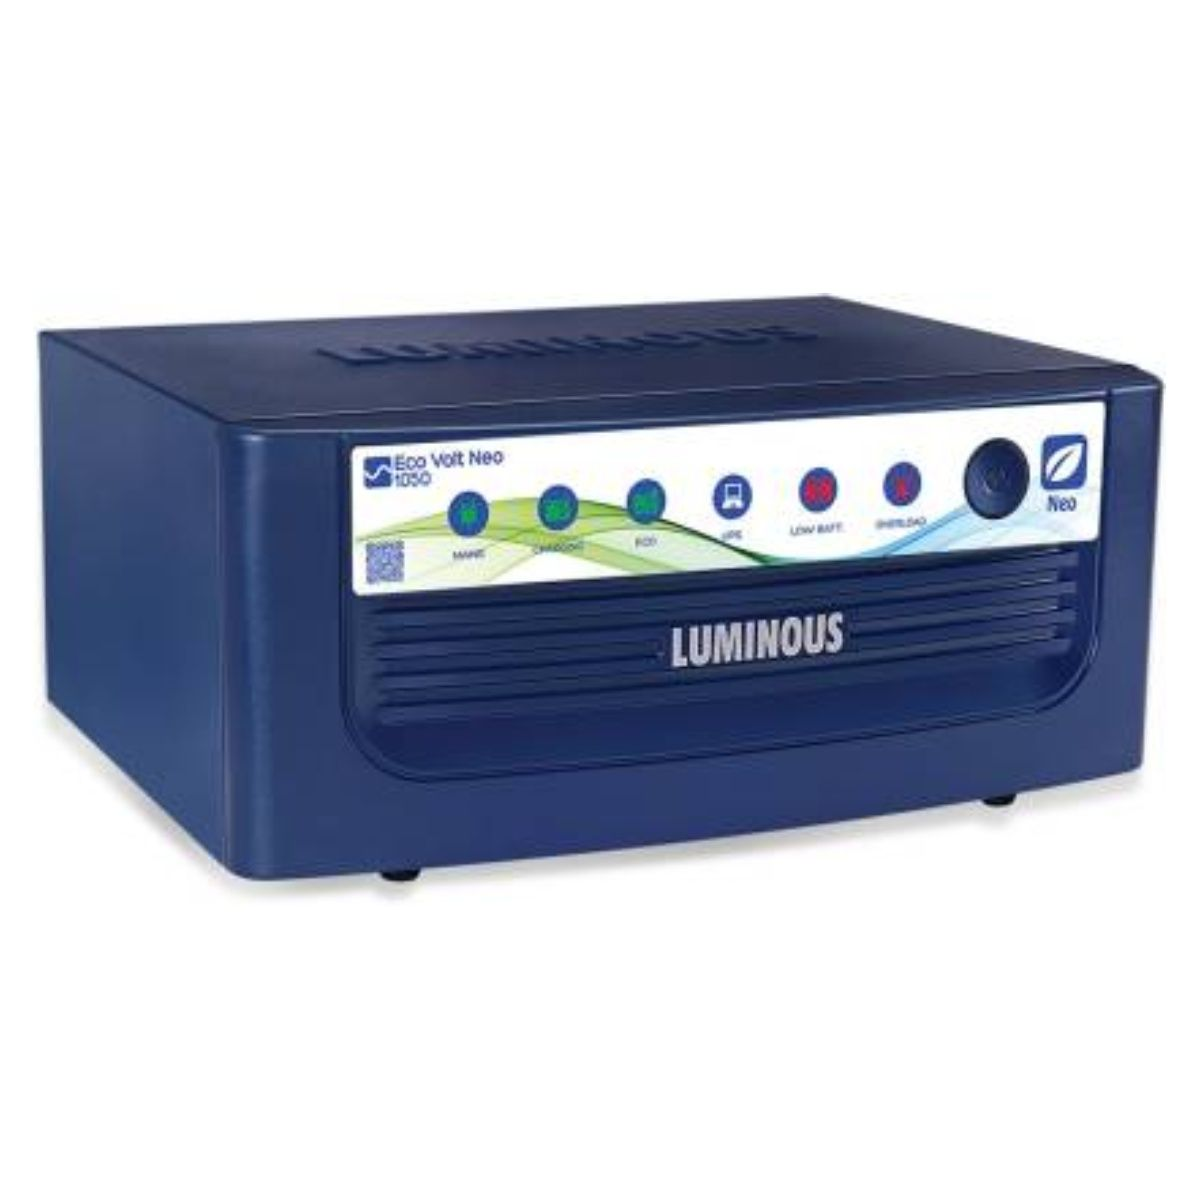 LUMINOUS Eco Volt Neo 1050 Pure Sine Wave Inverter